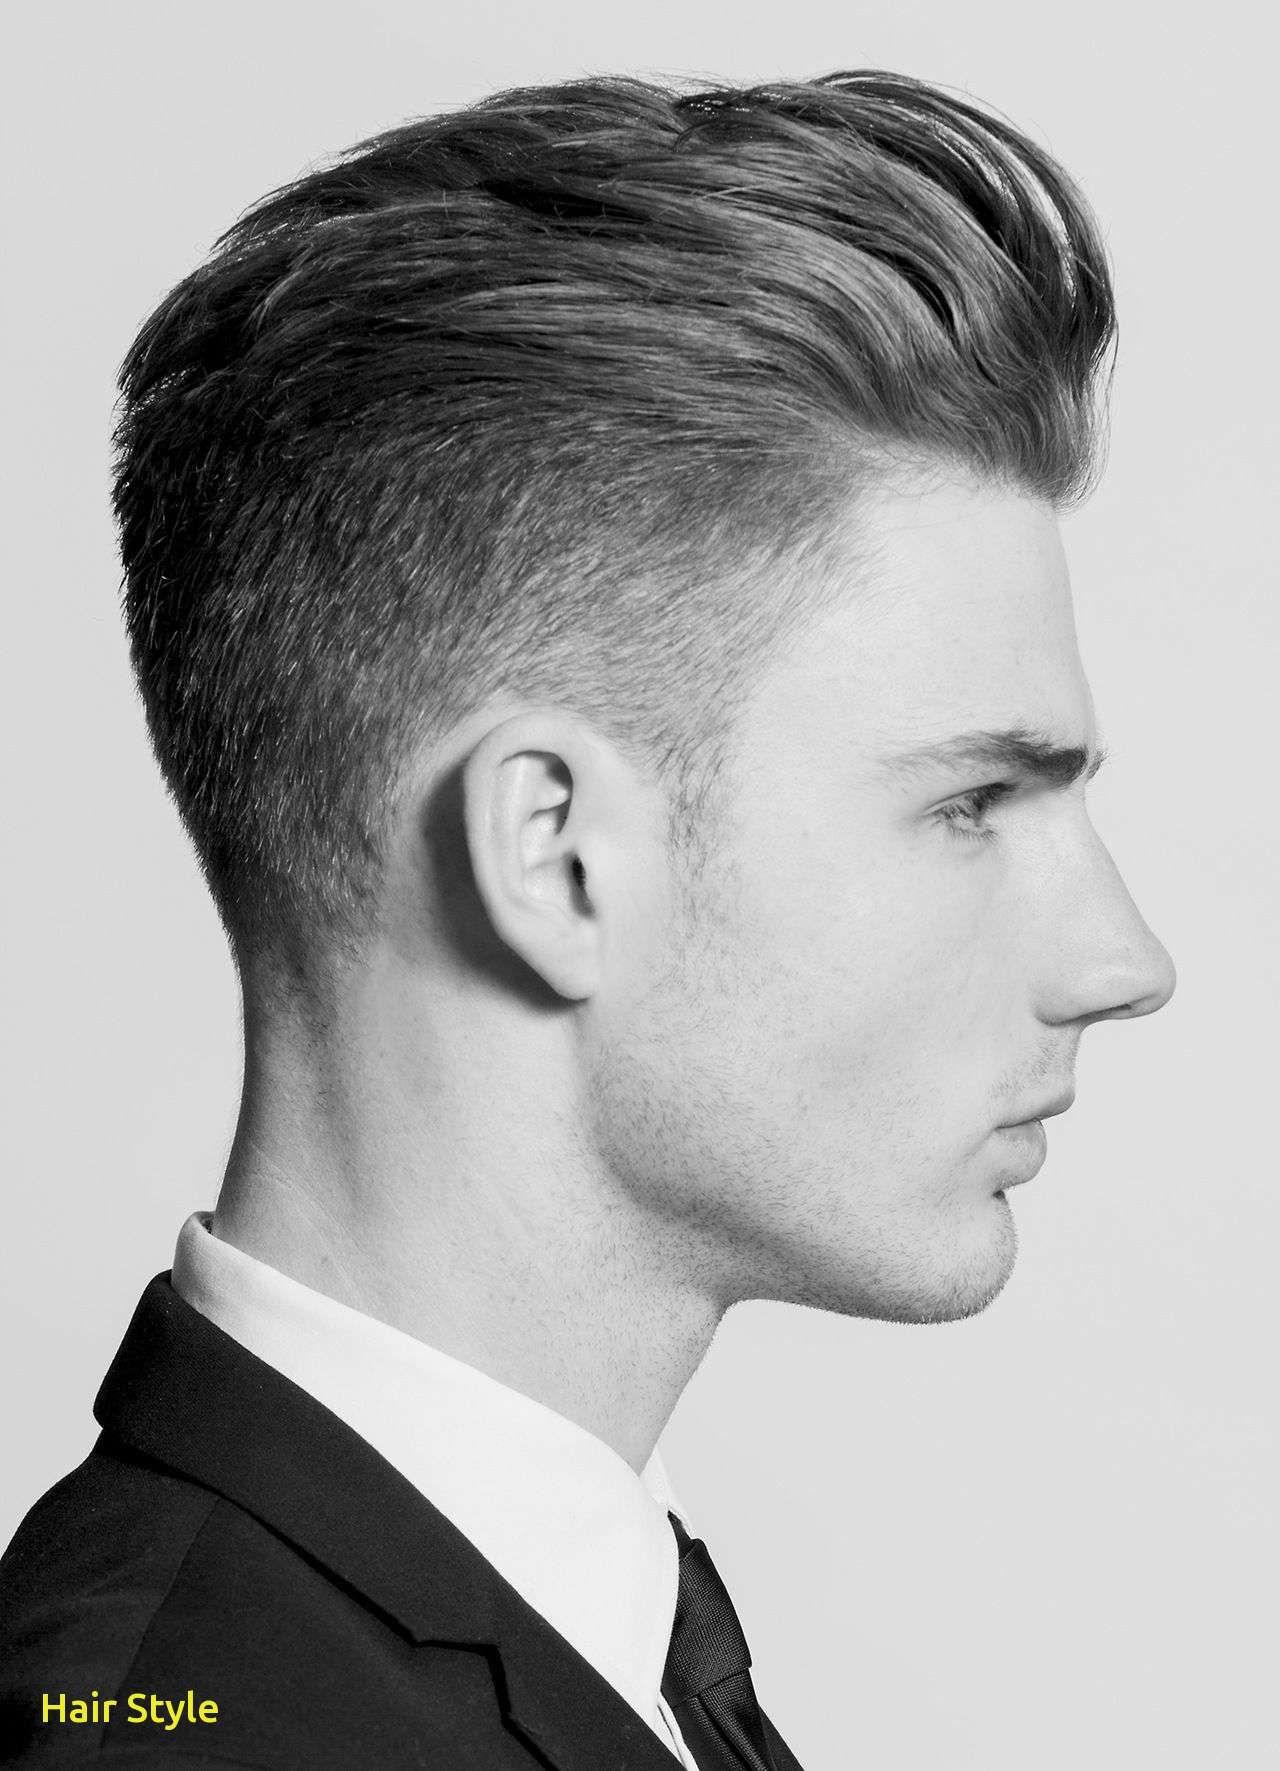 Kurze Frisuren Der Neuen Männer Für Dünnes Haar